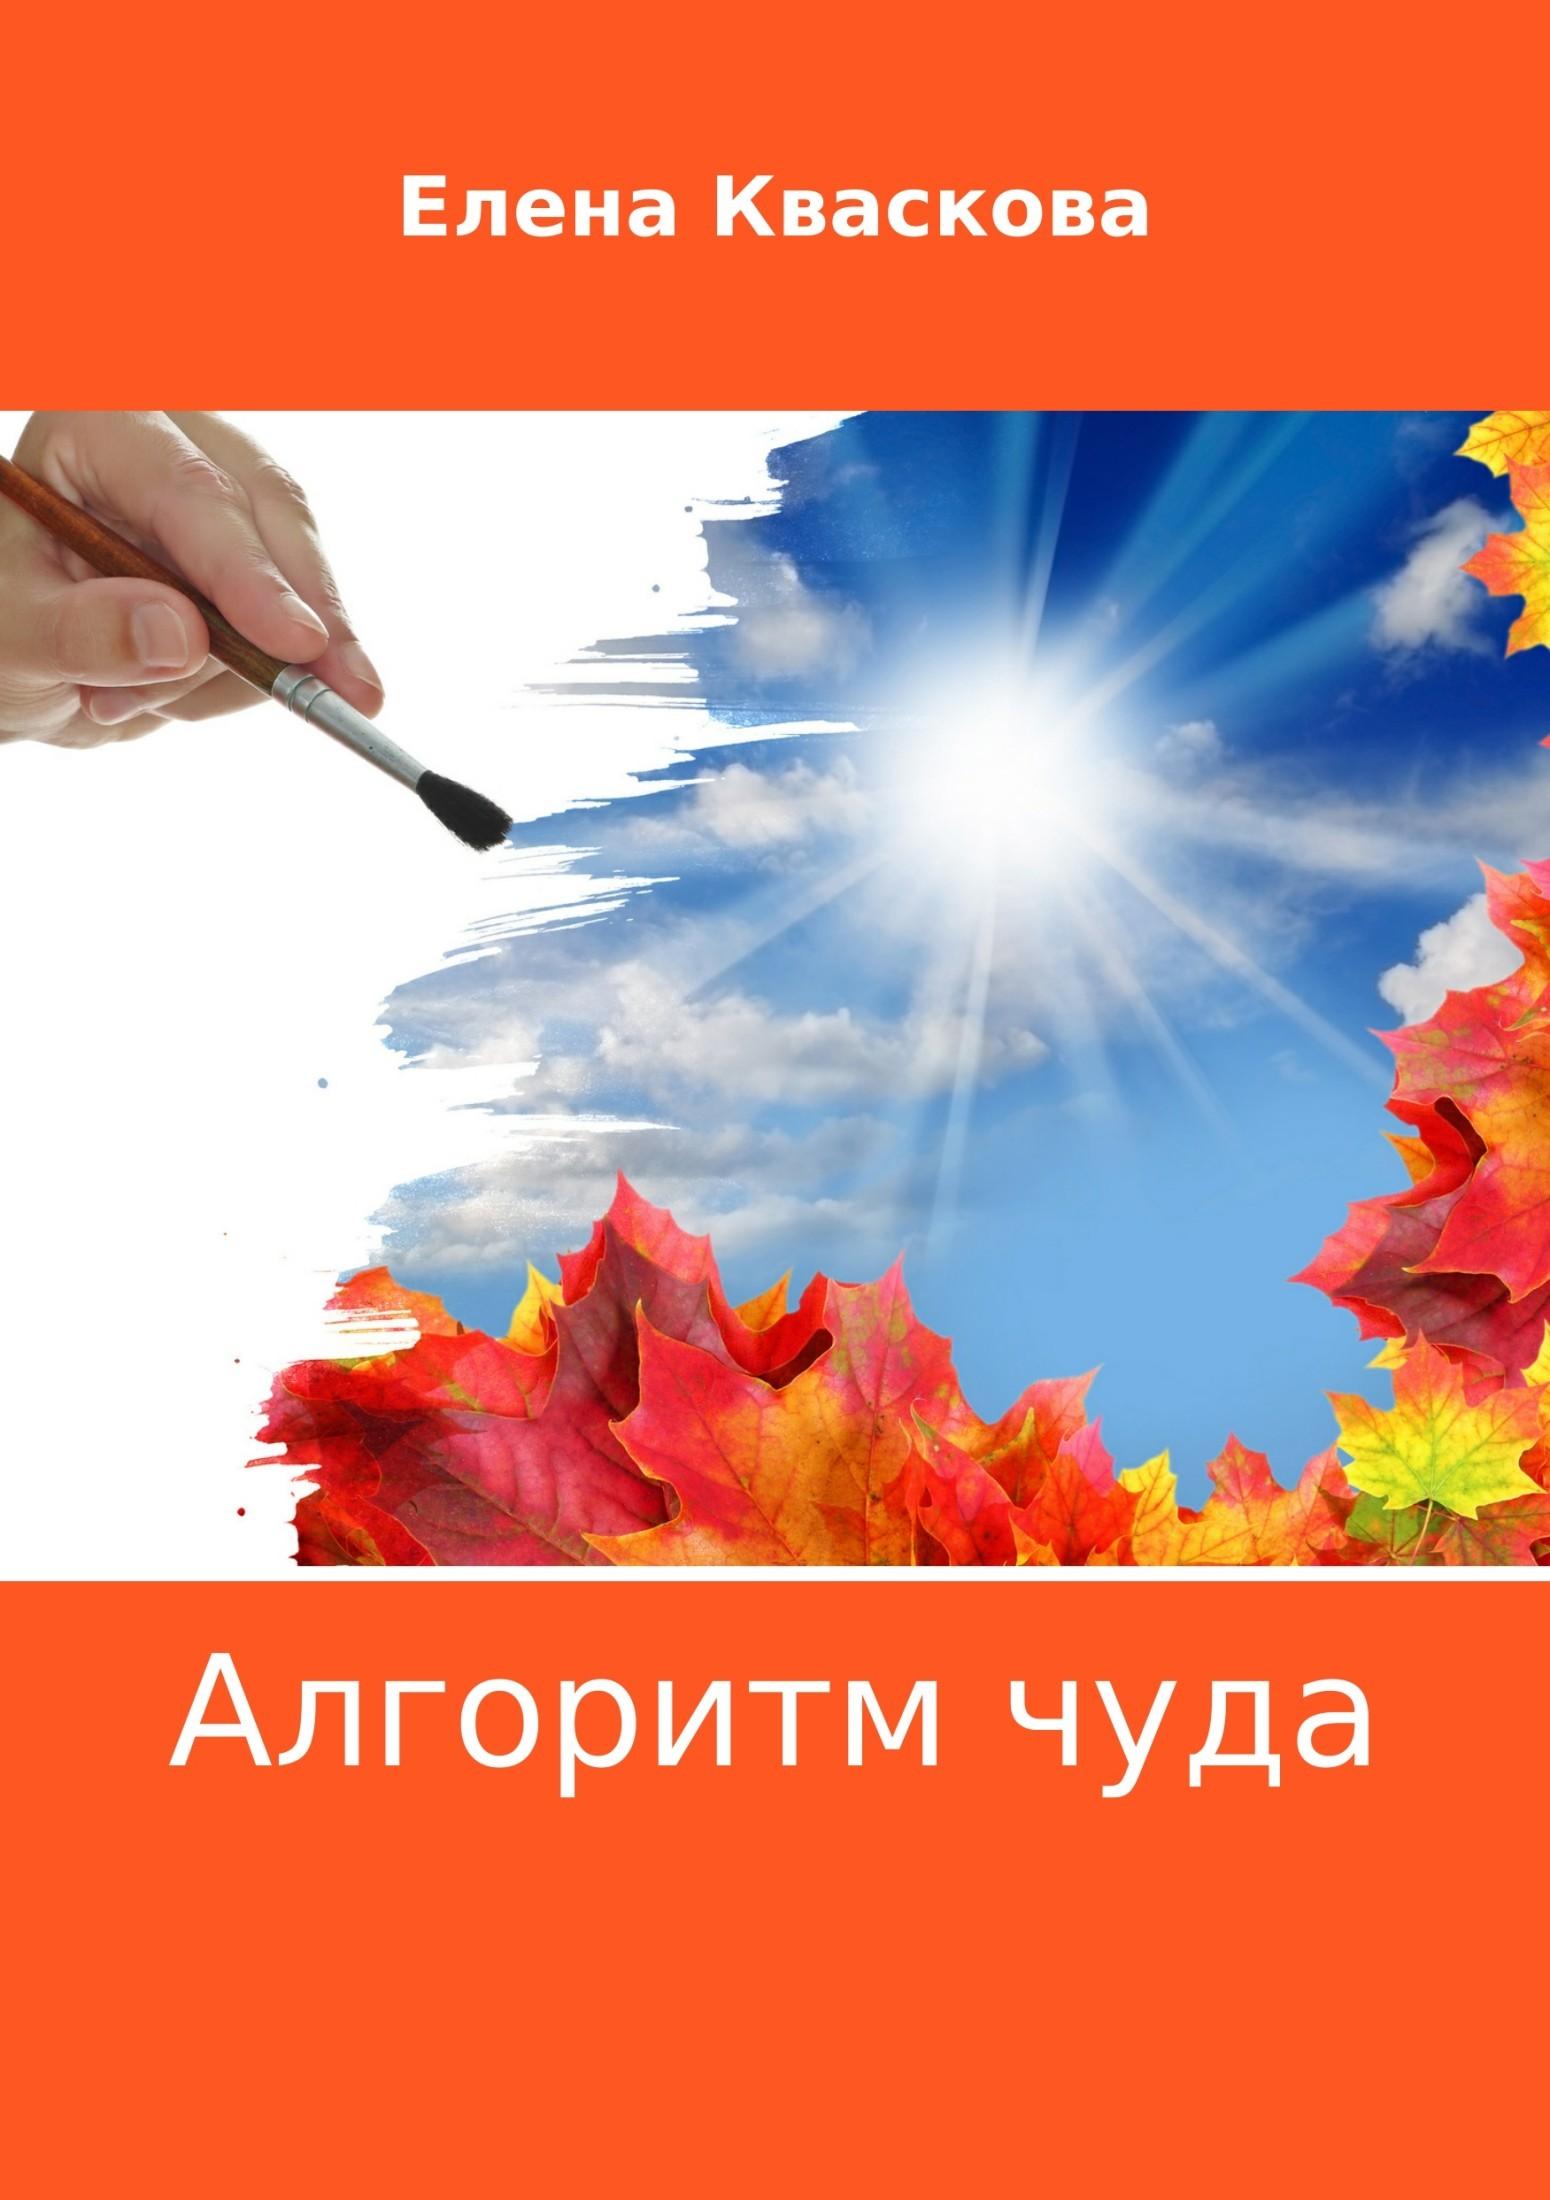 Елена Александровна Кваскова Алгоритм чуда благинина елена александровна не мешайте мне трудиться